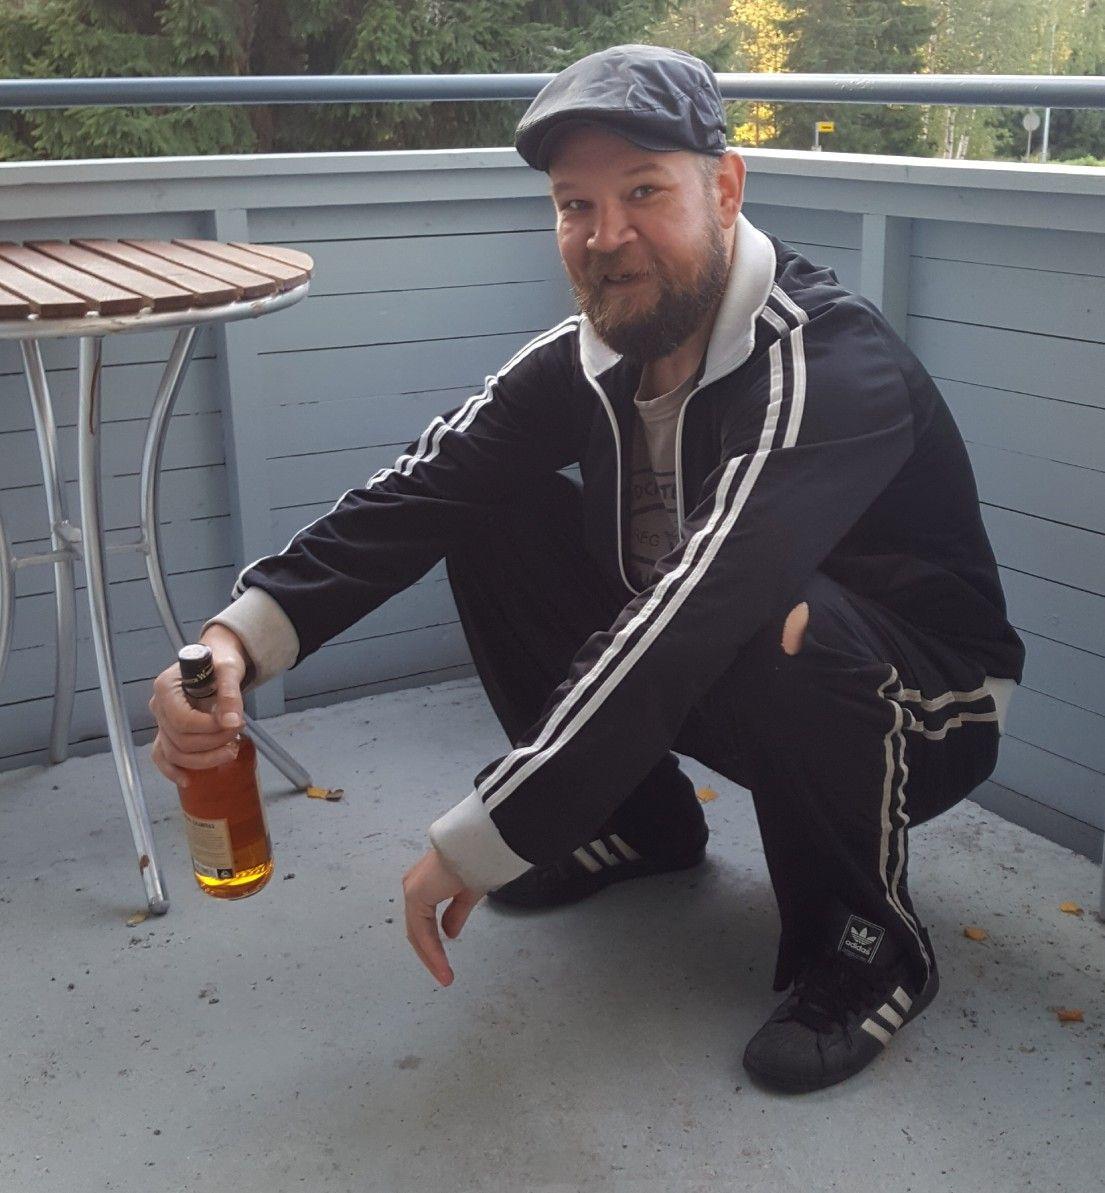 Pin on slav | Music genres, Slav squat, Radio